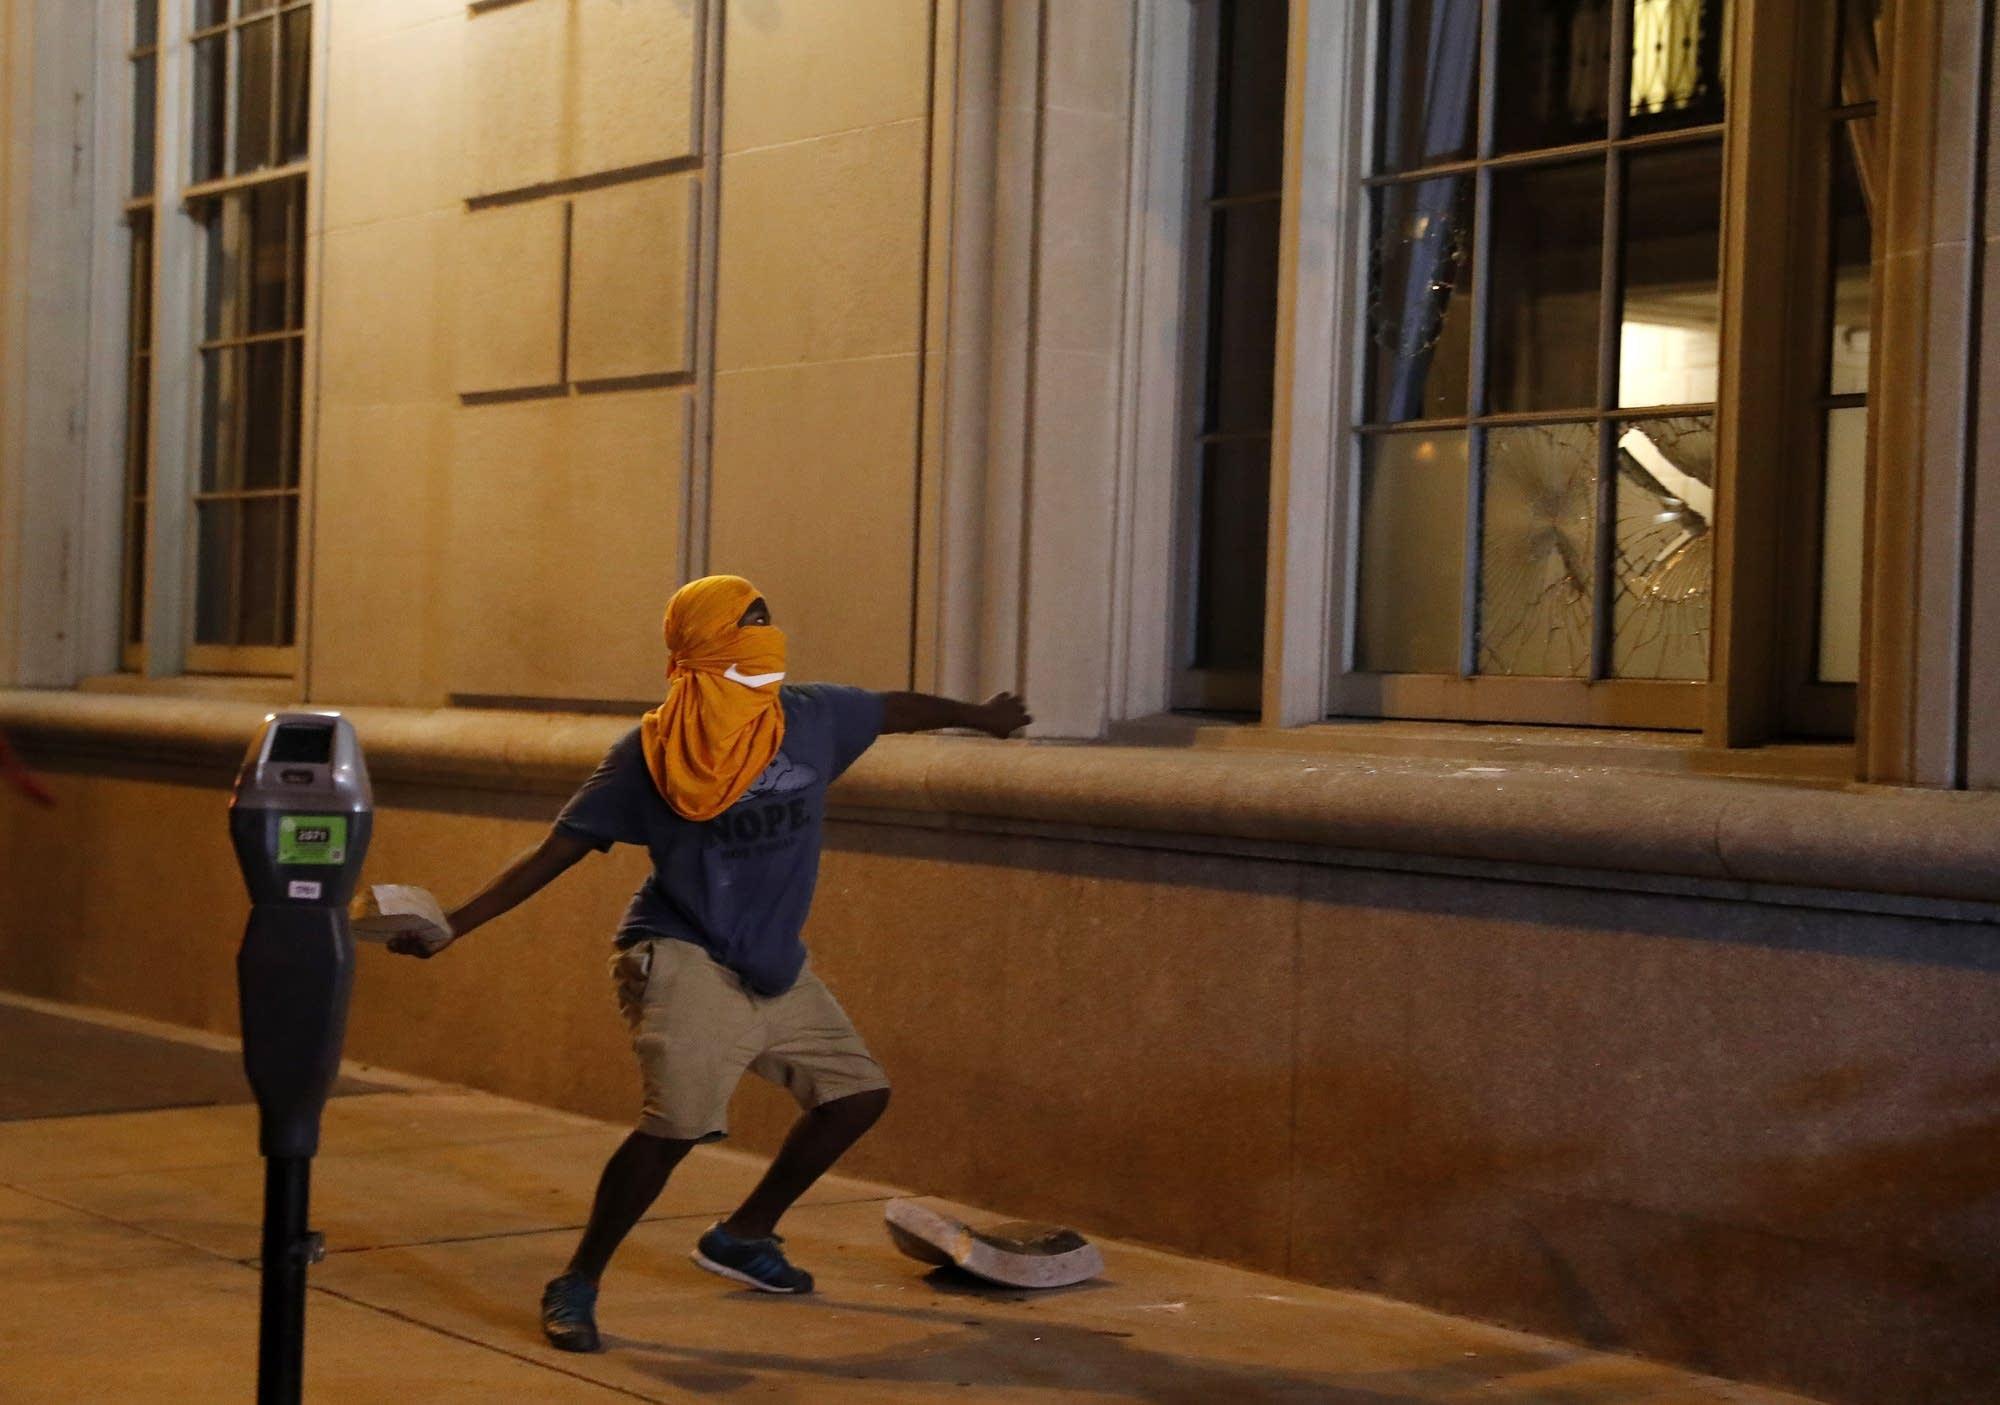 99a2d9-20170918-st-louis-violence.jpg